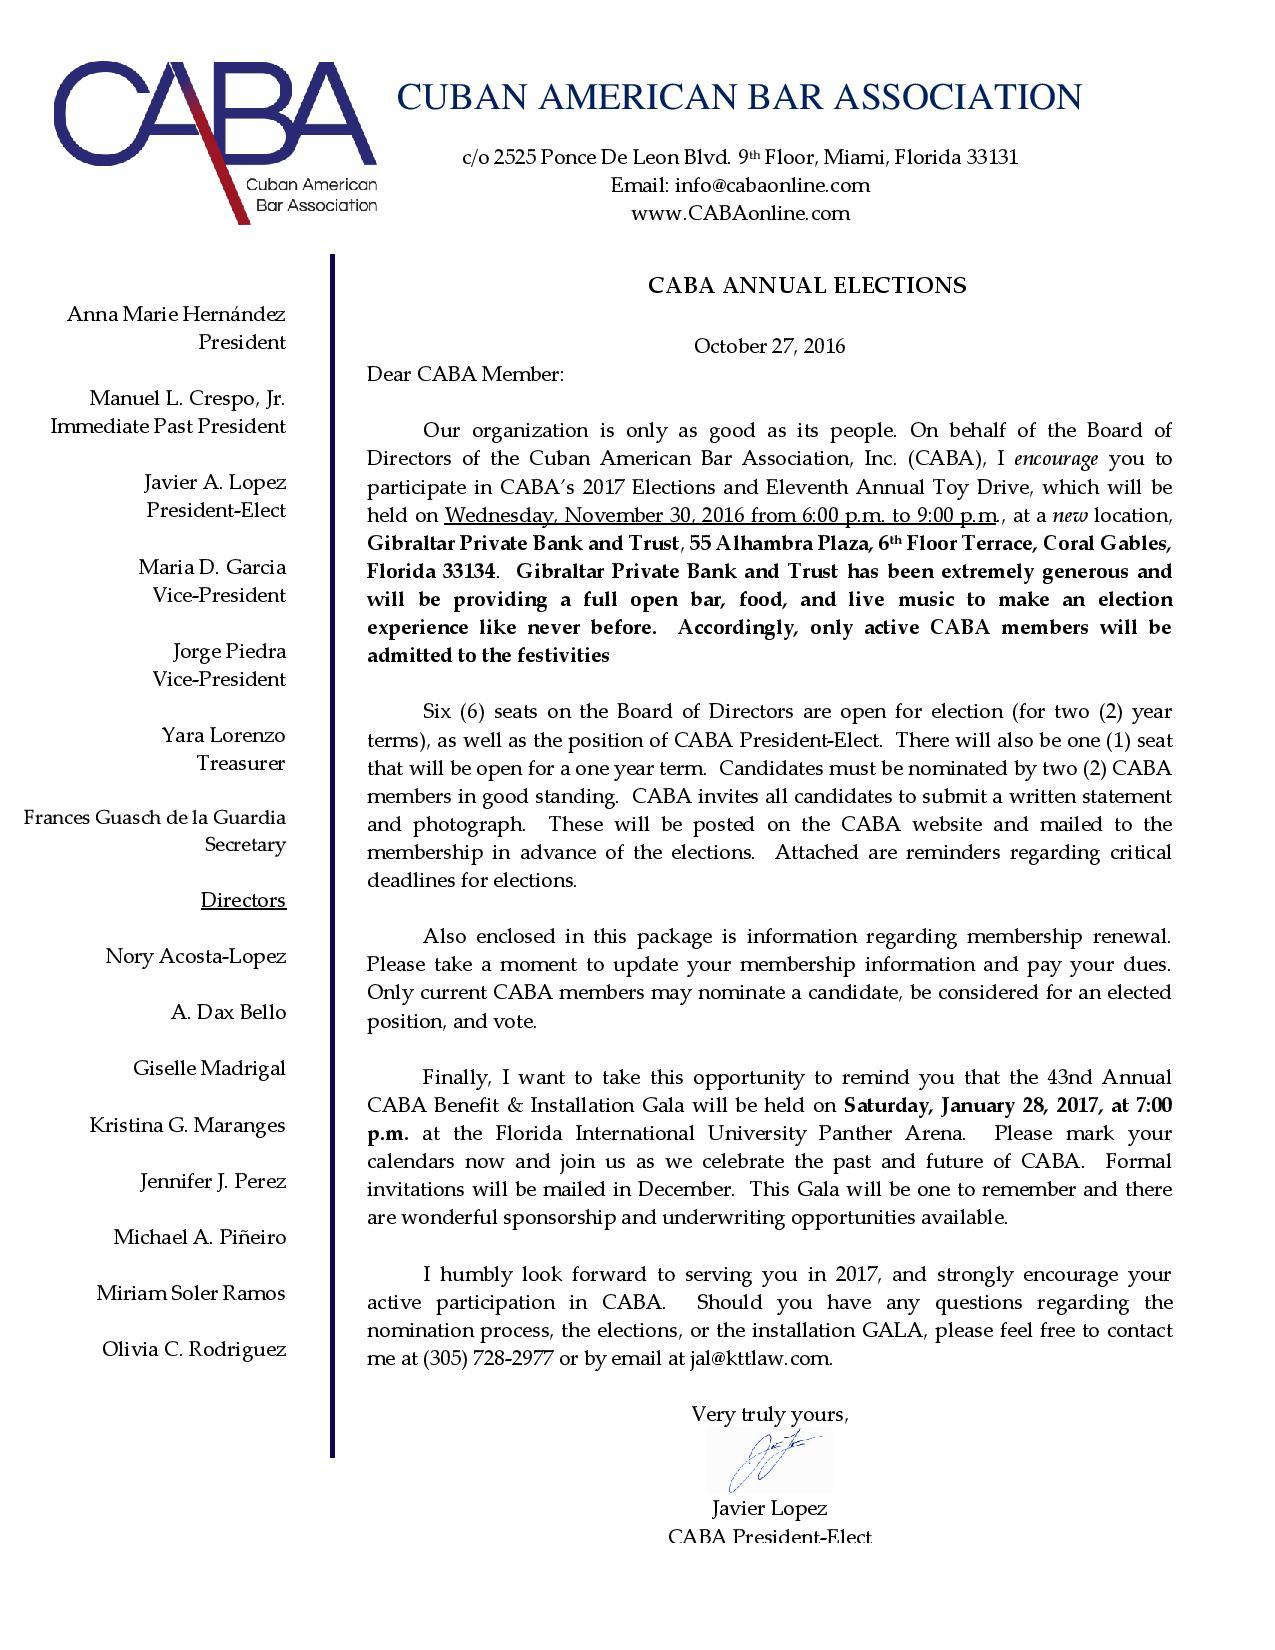 Caba Annual Elections Cuban American Bar Association